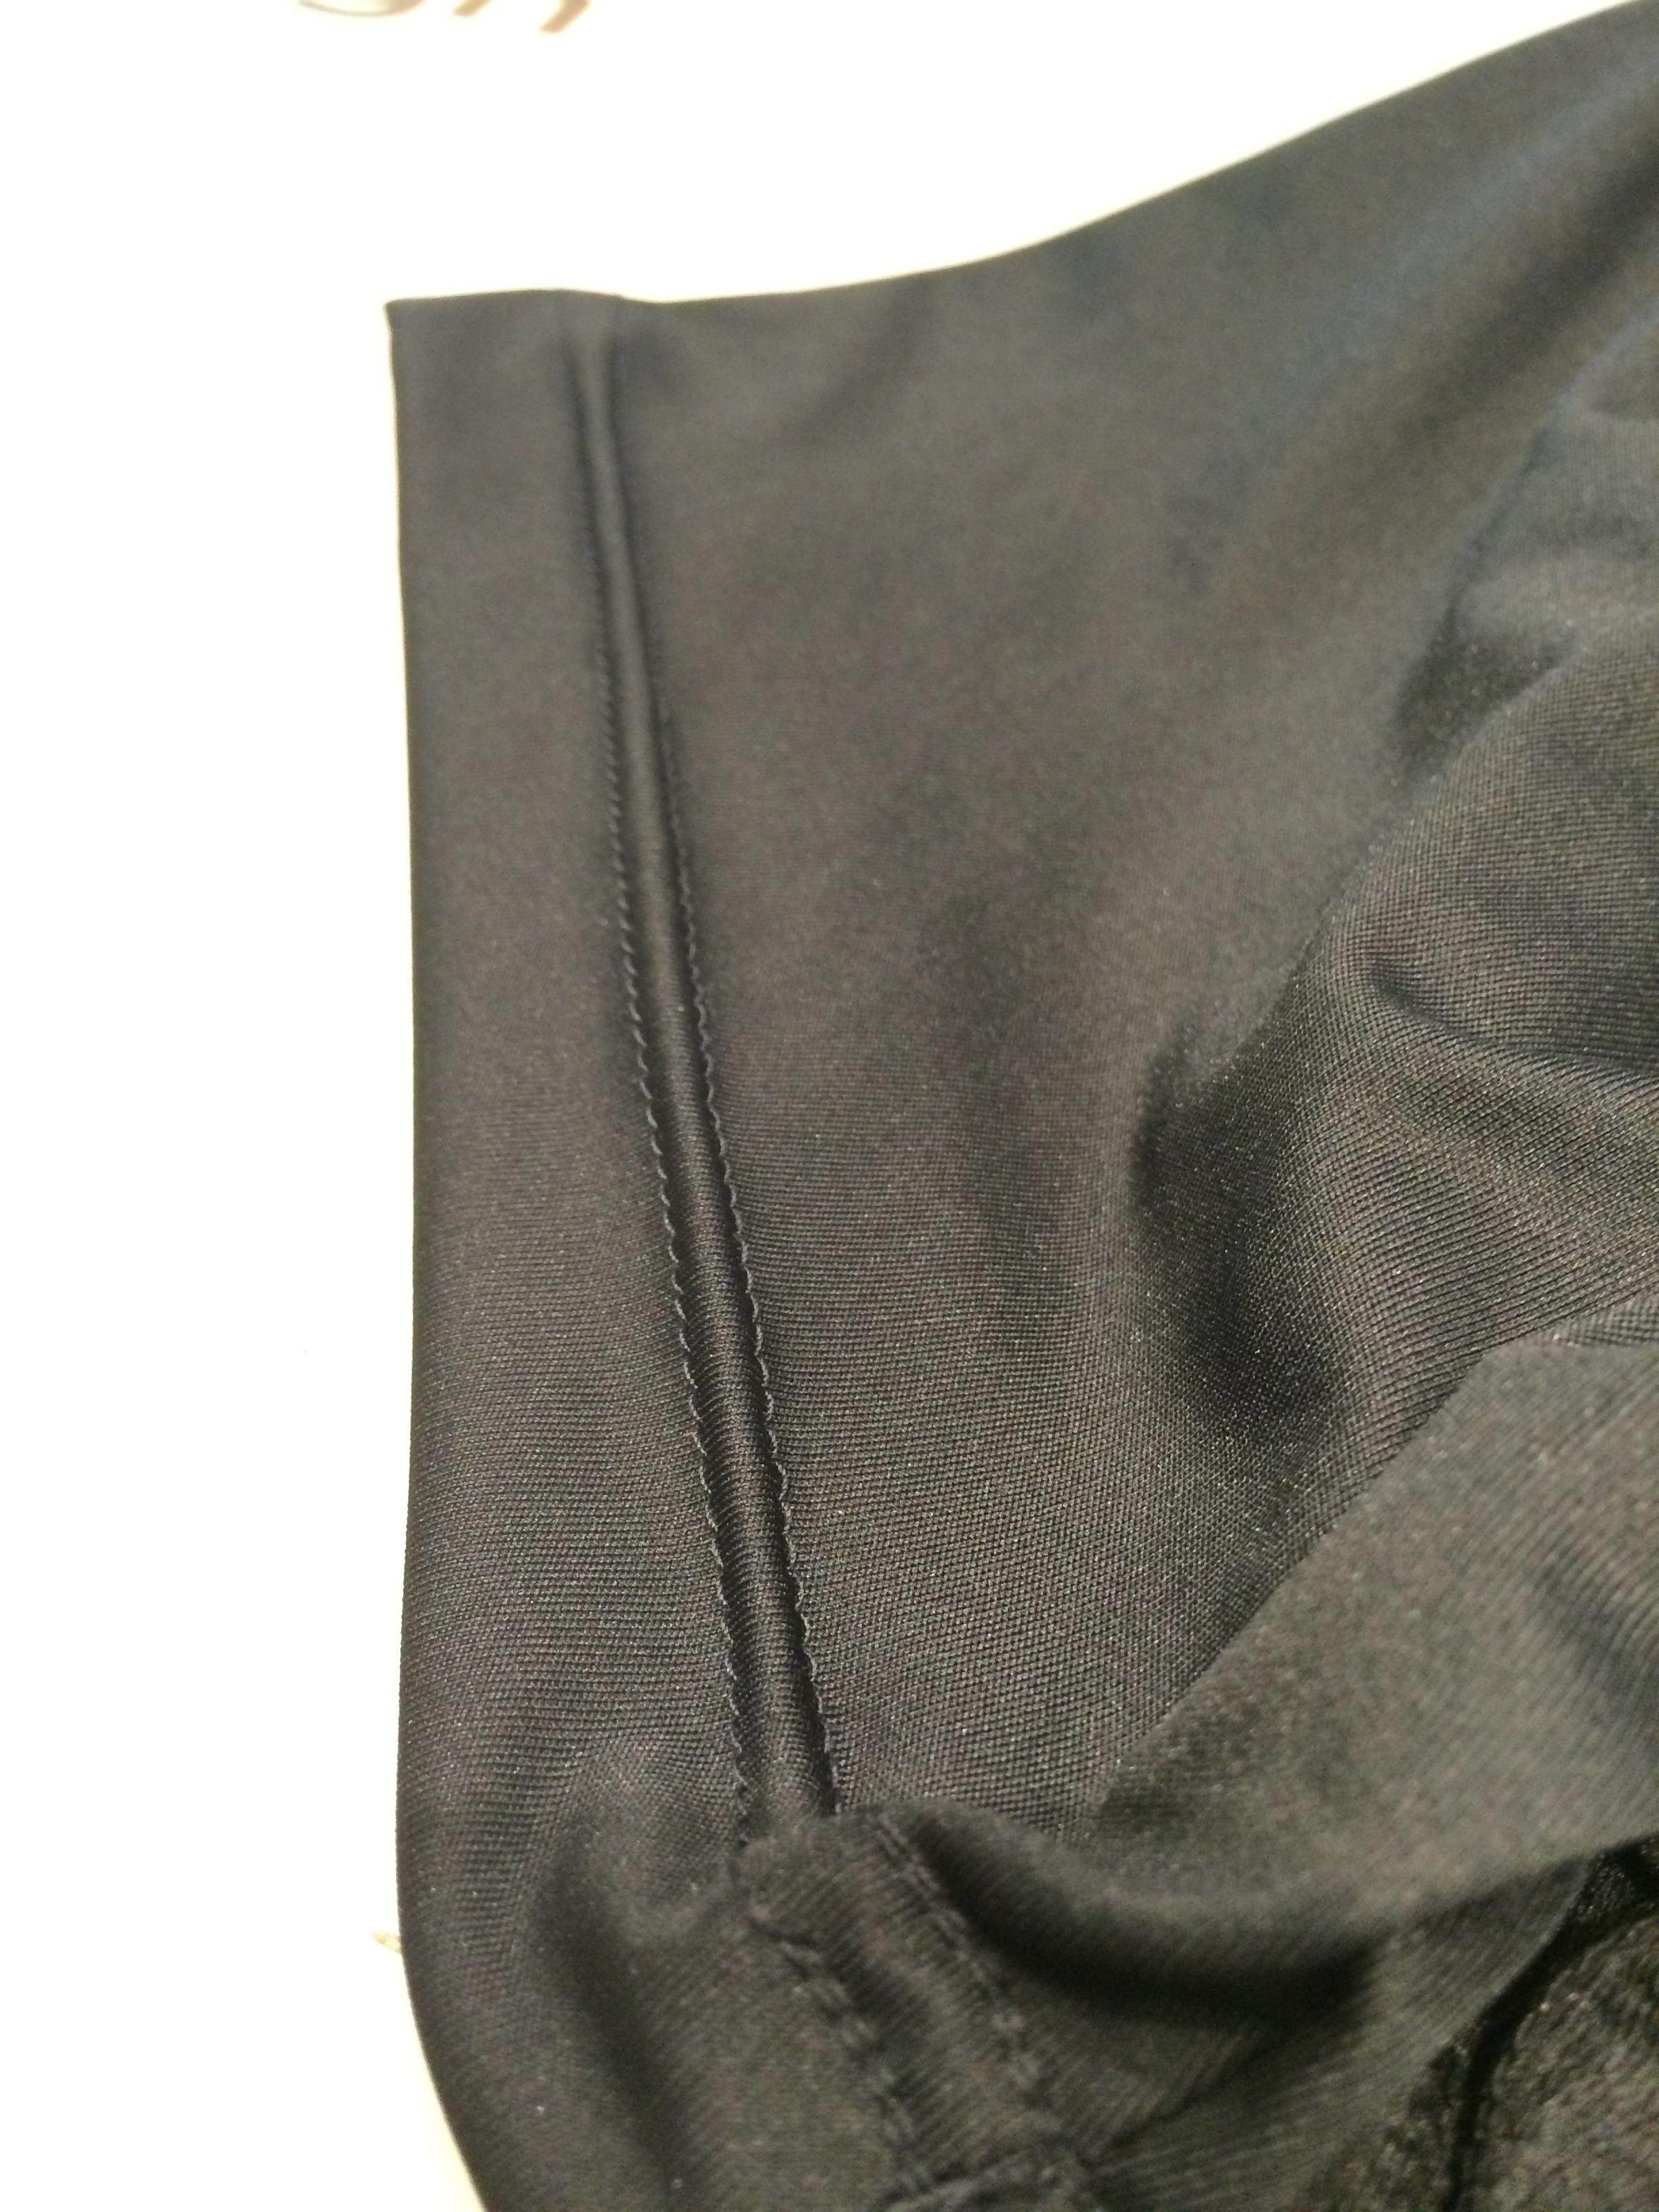 Adidas Tunneling on Shirt Hem